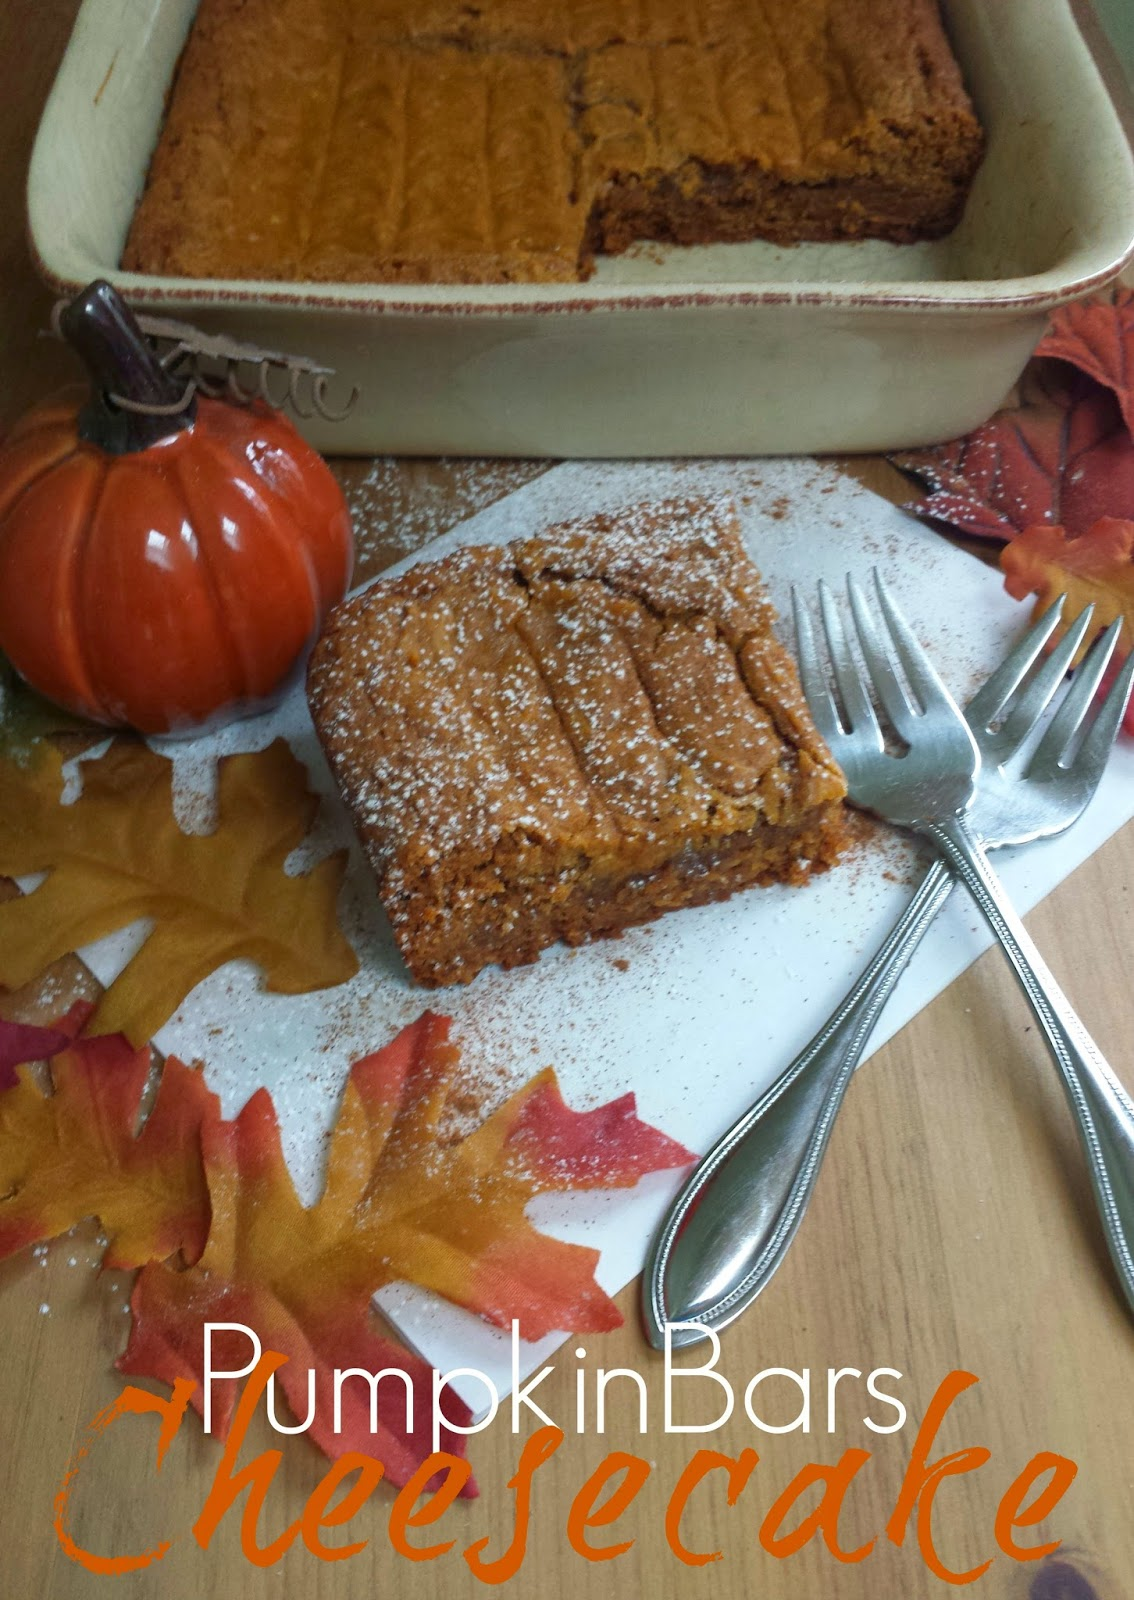 pumpkin cheesescake for kids